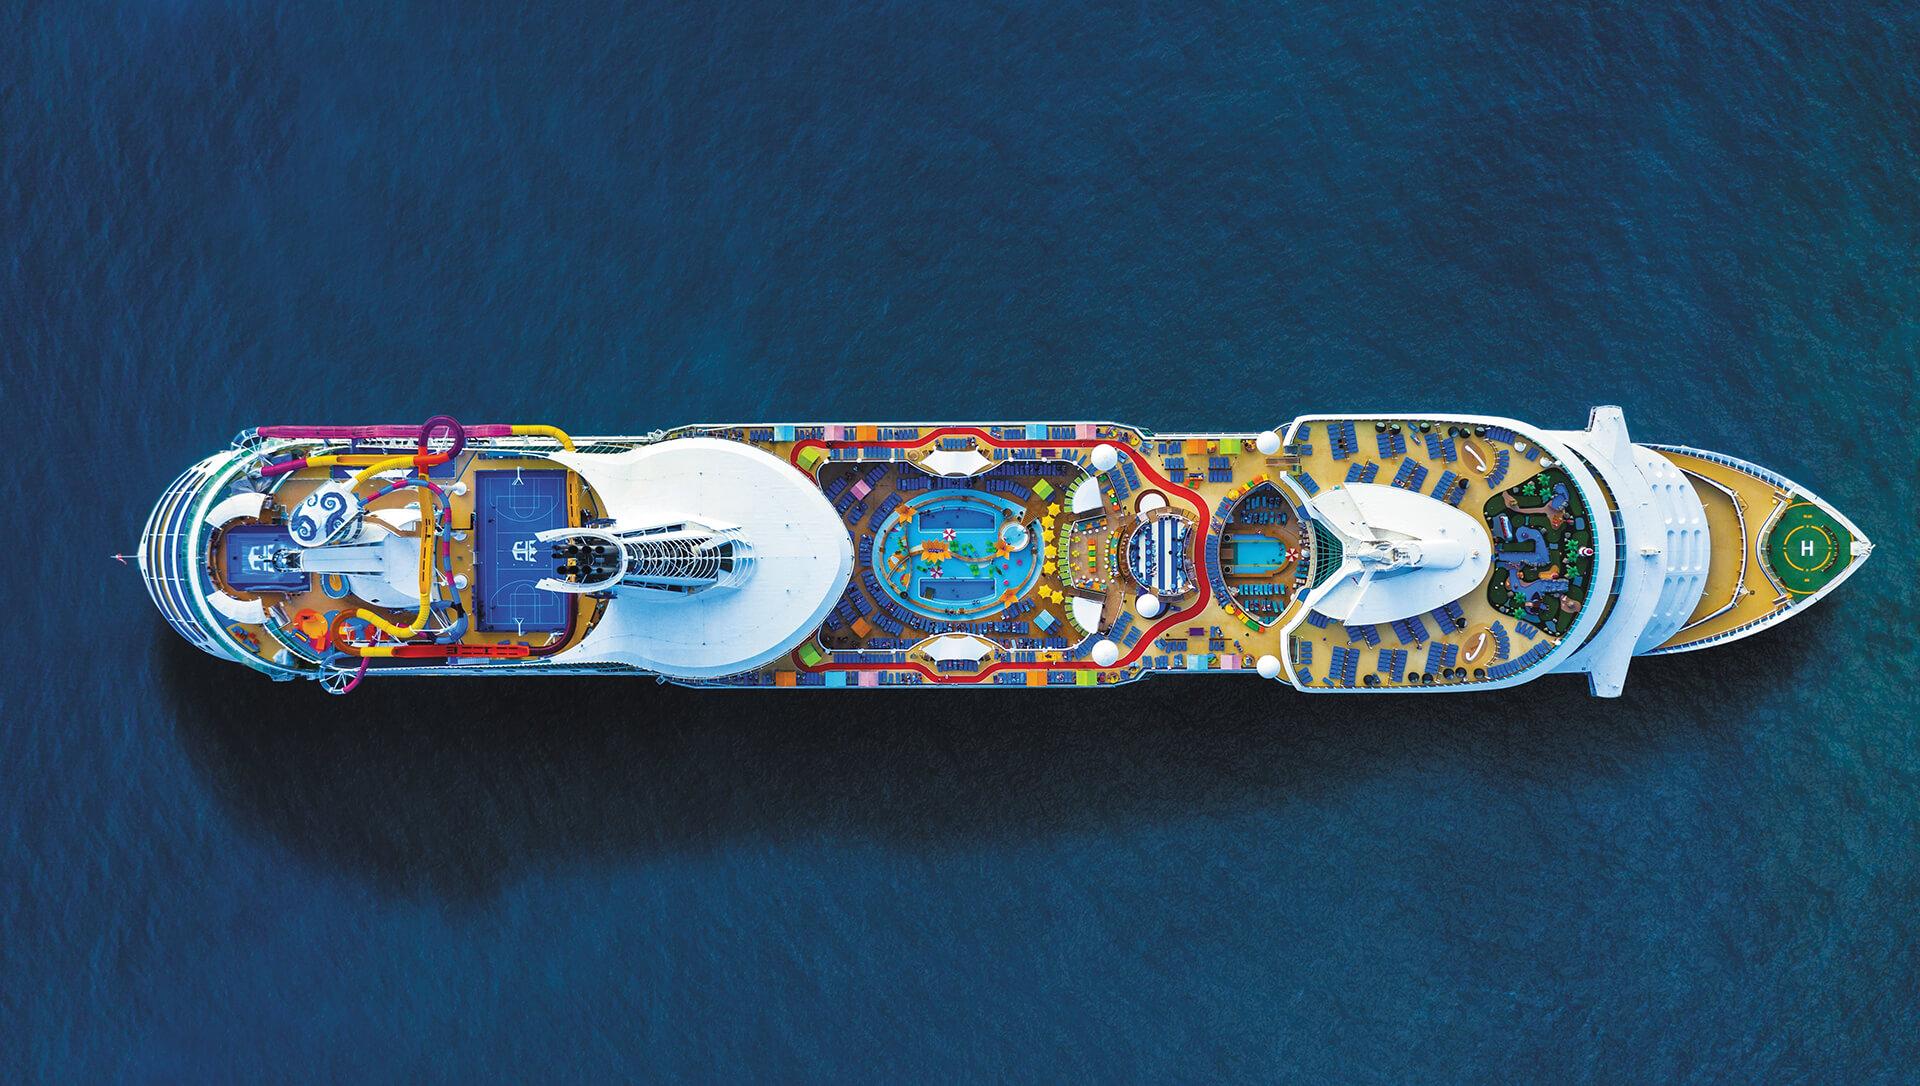 Royal Caribbean's Navigator of the Seas Aerial View